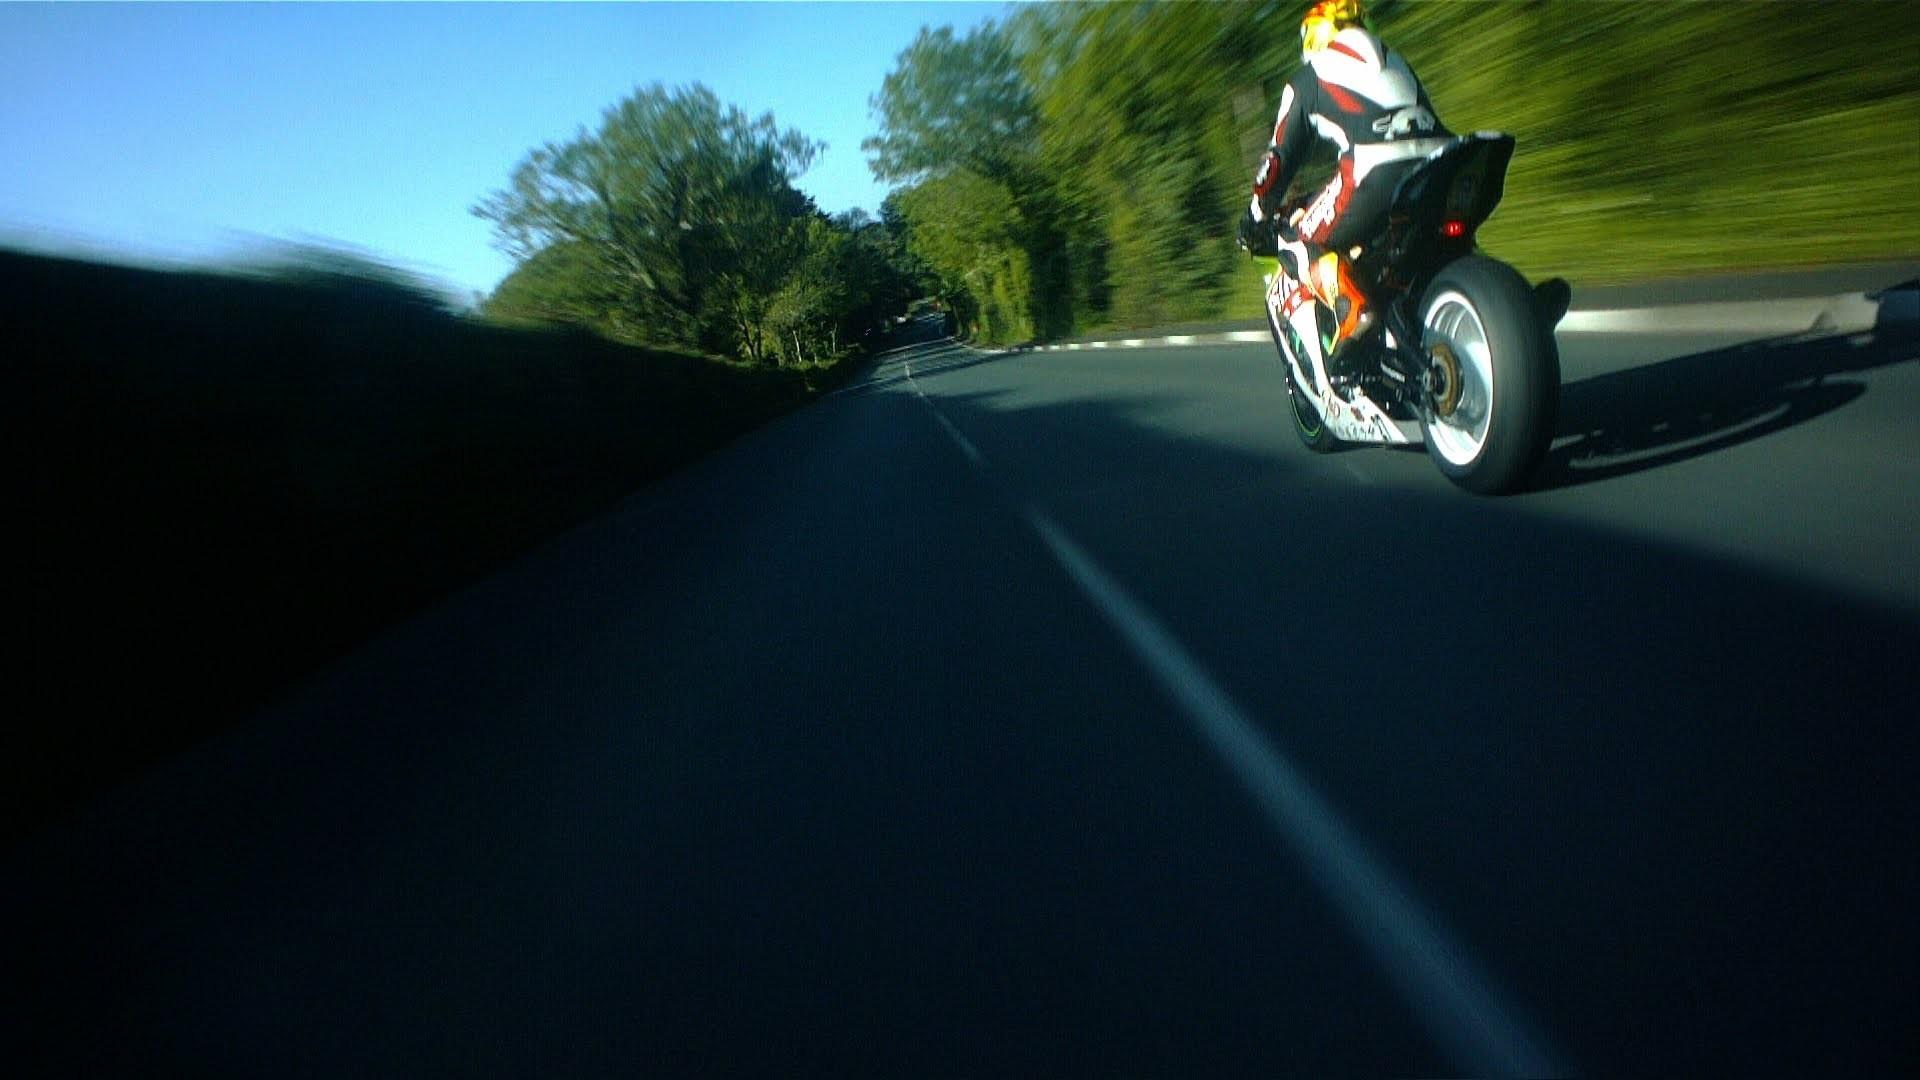 Conor Cummins – Honda Racing – TT 2014 – On Bike – Practice – HD